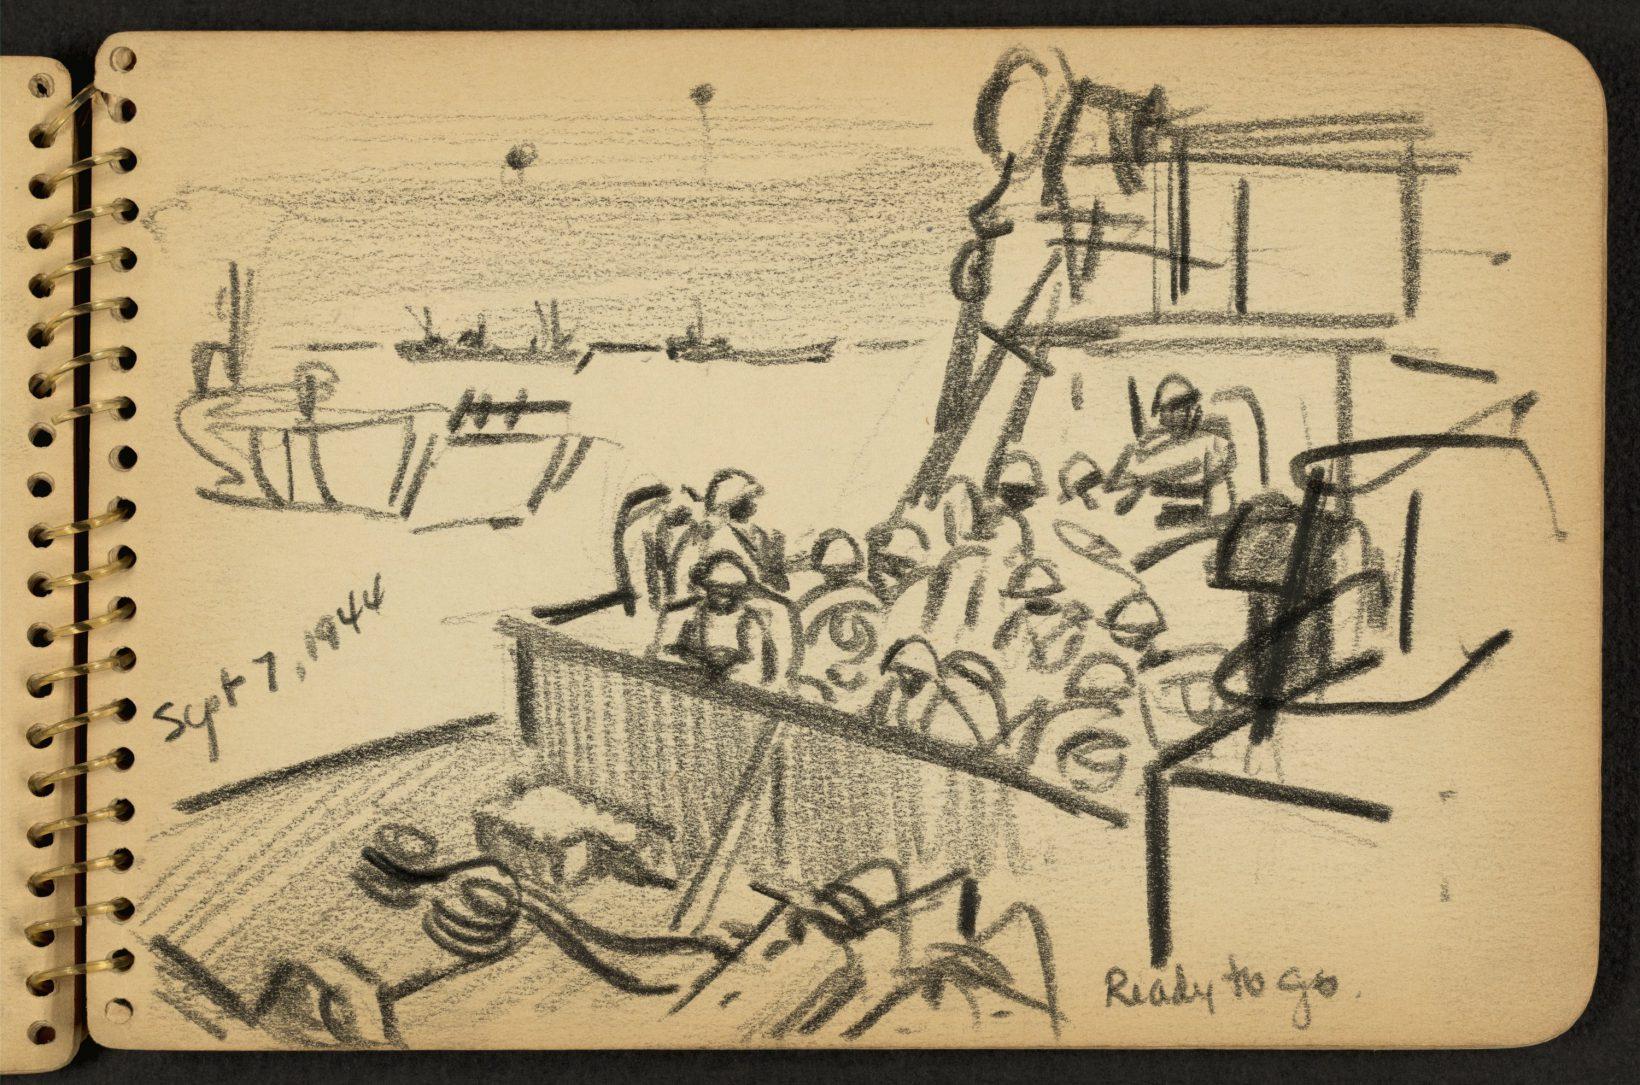 victor-lundy-carnet-croquis-seconde-guerre-mondiale-47